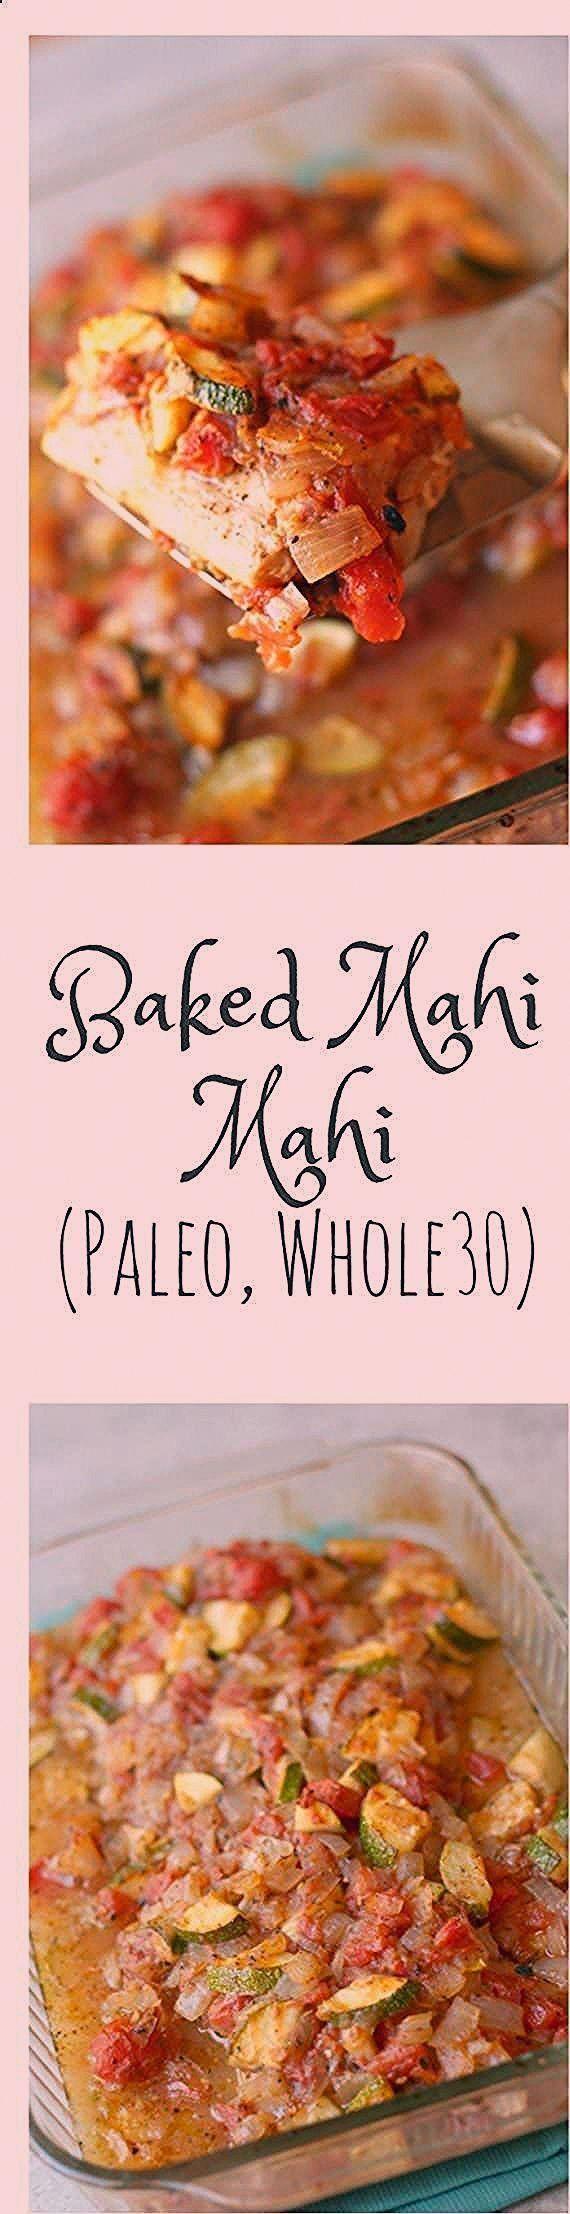 Photo of Baked Mahi Mahi with Vegetables (Paleo Whole30) snaper fish recipes;tapia fish #…